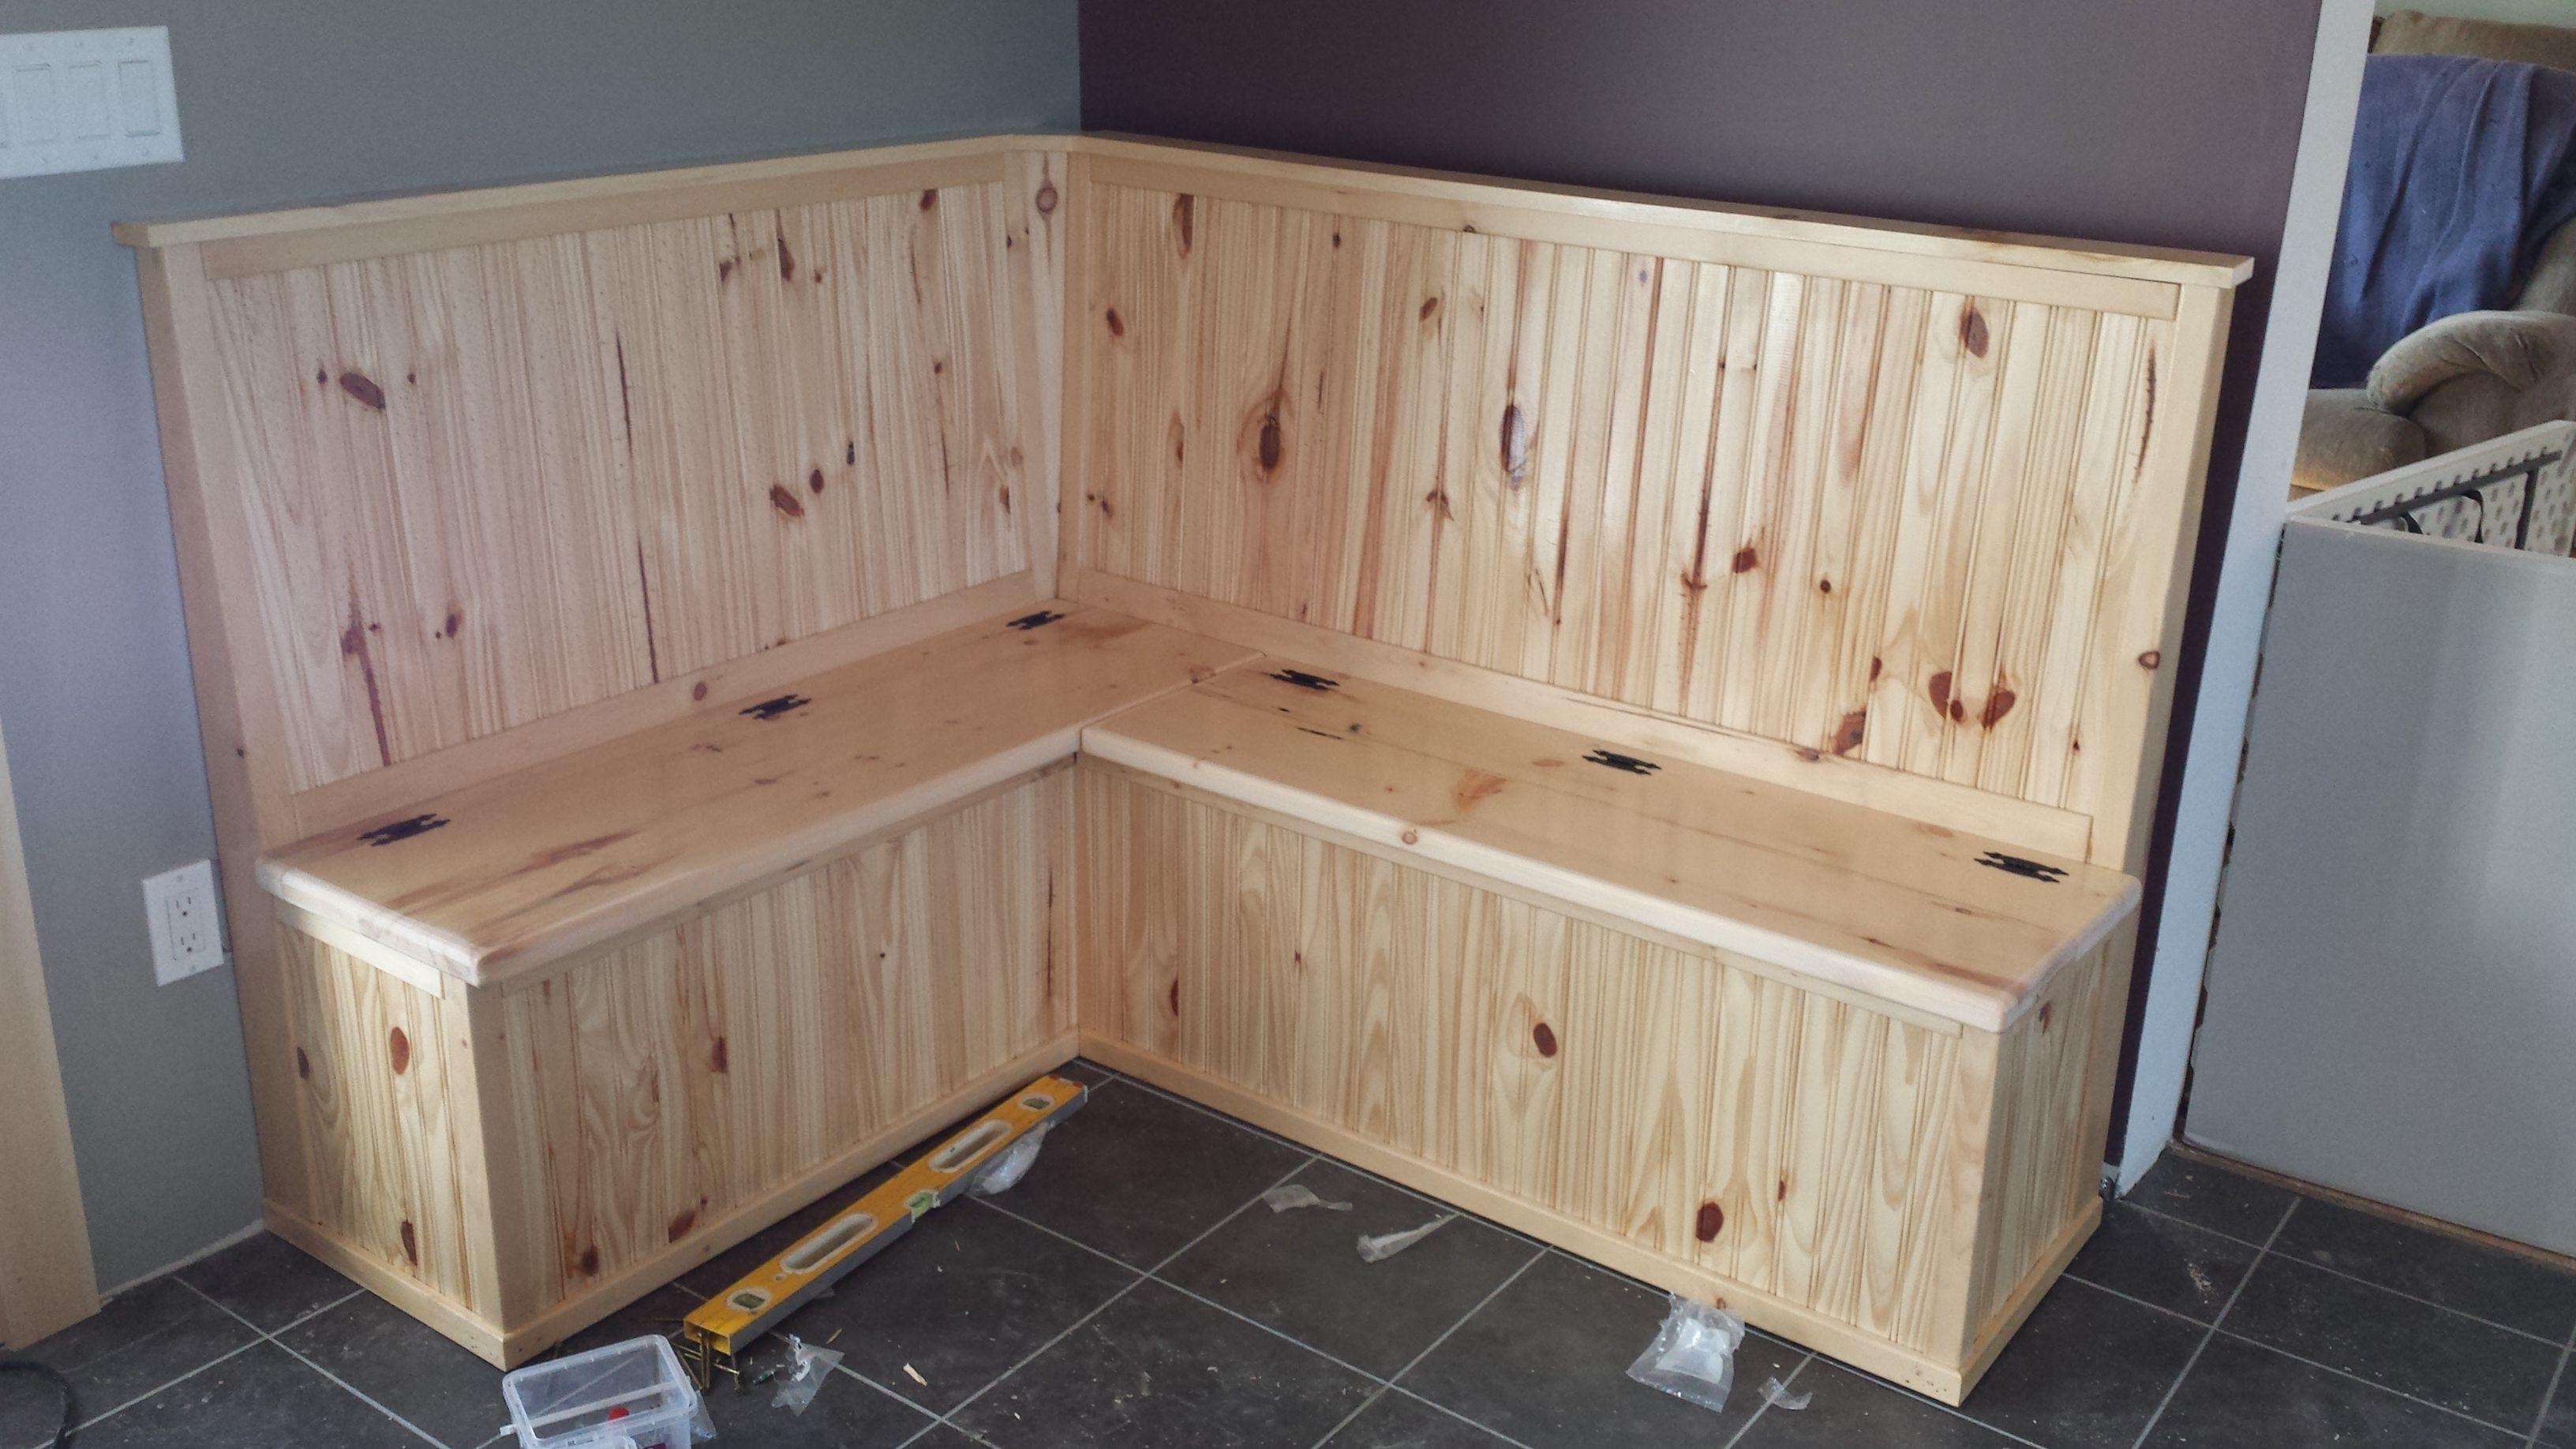 diy open seat bench, breakfast nook, knotty pine, mudroom table